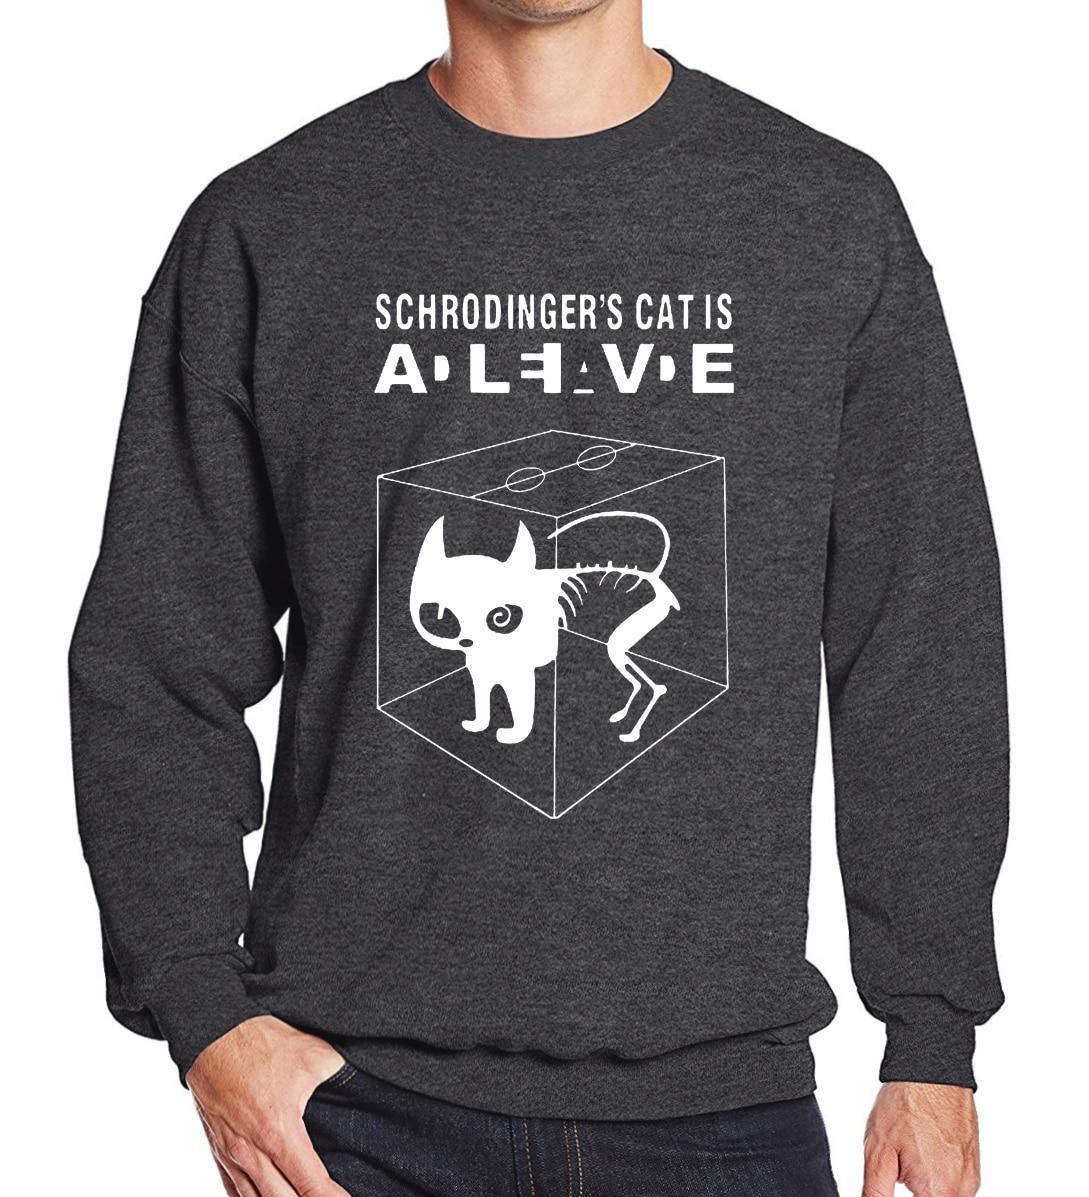 The Schrodinger's Cat 2019 autumn winter casual sweatshirt hoodies men tracksuit harajuku brand Big Bang Theory pullovers S-XXL